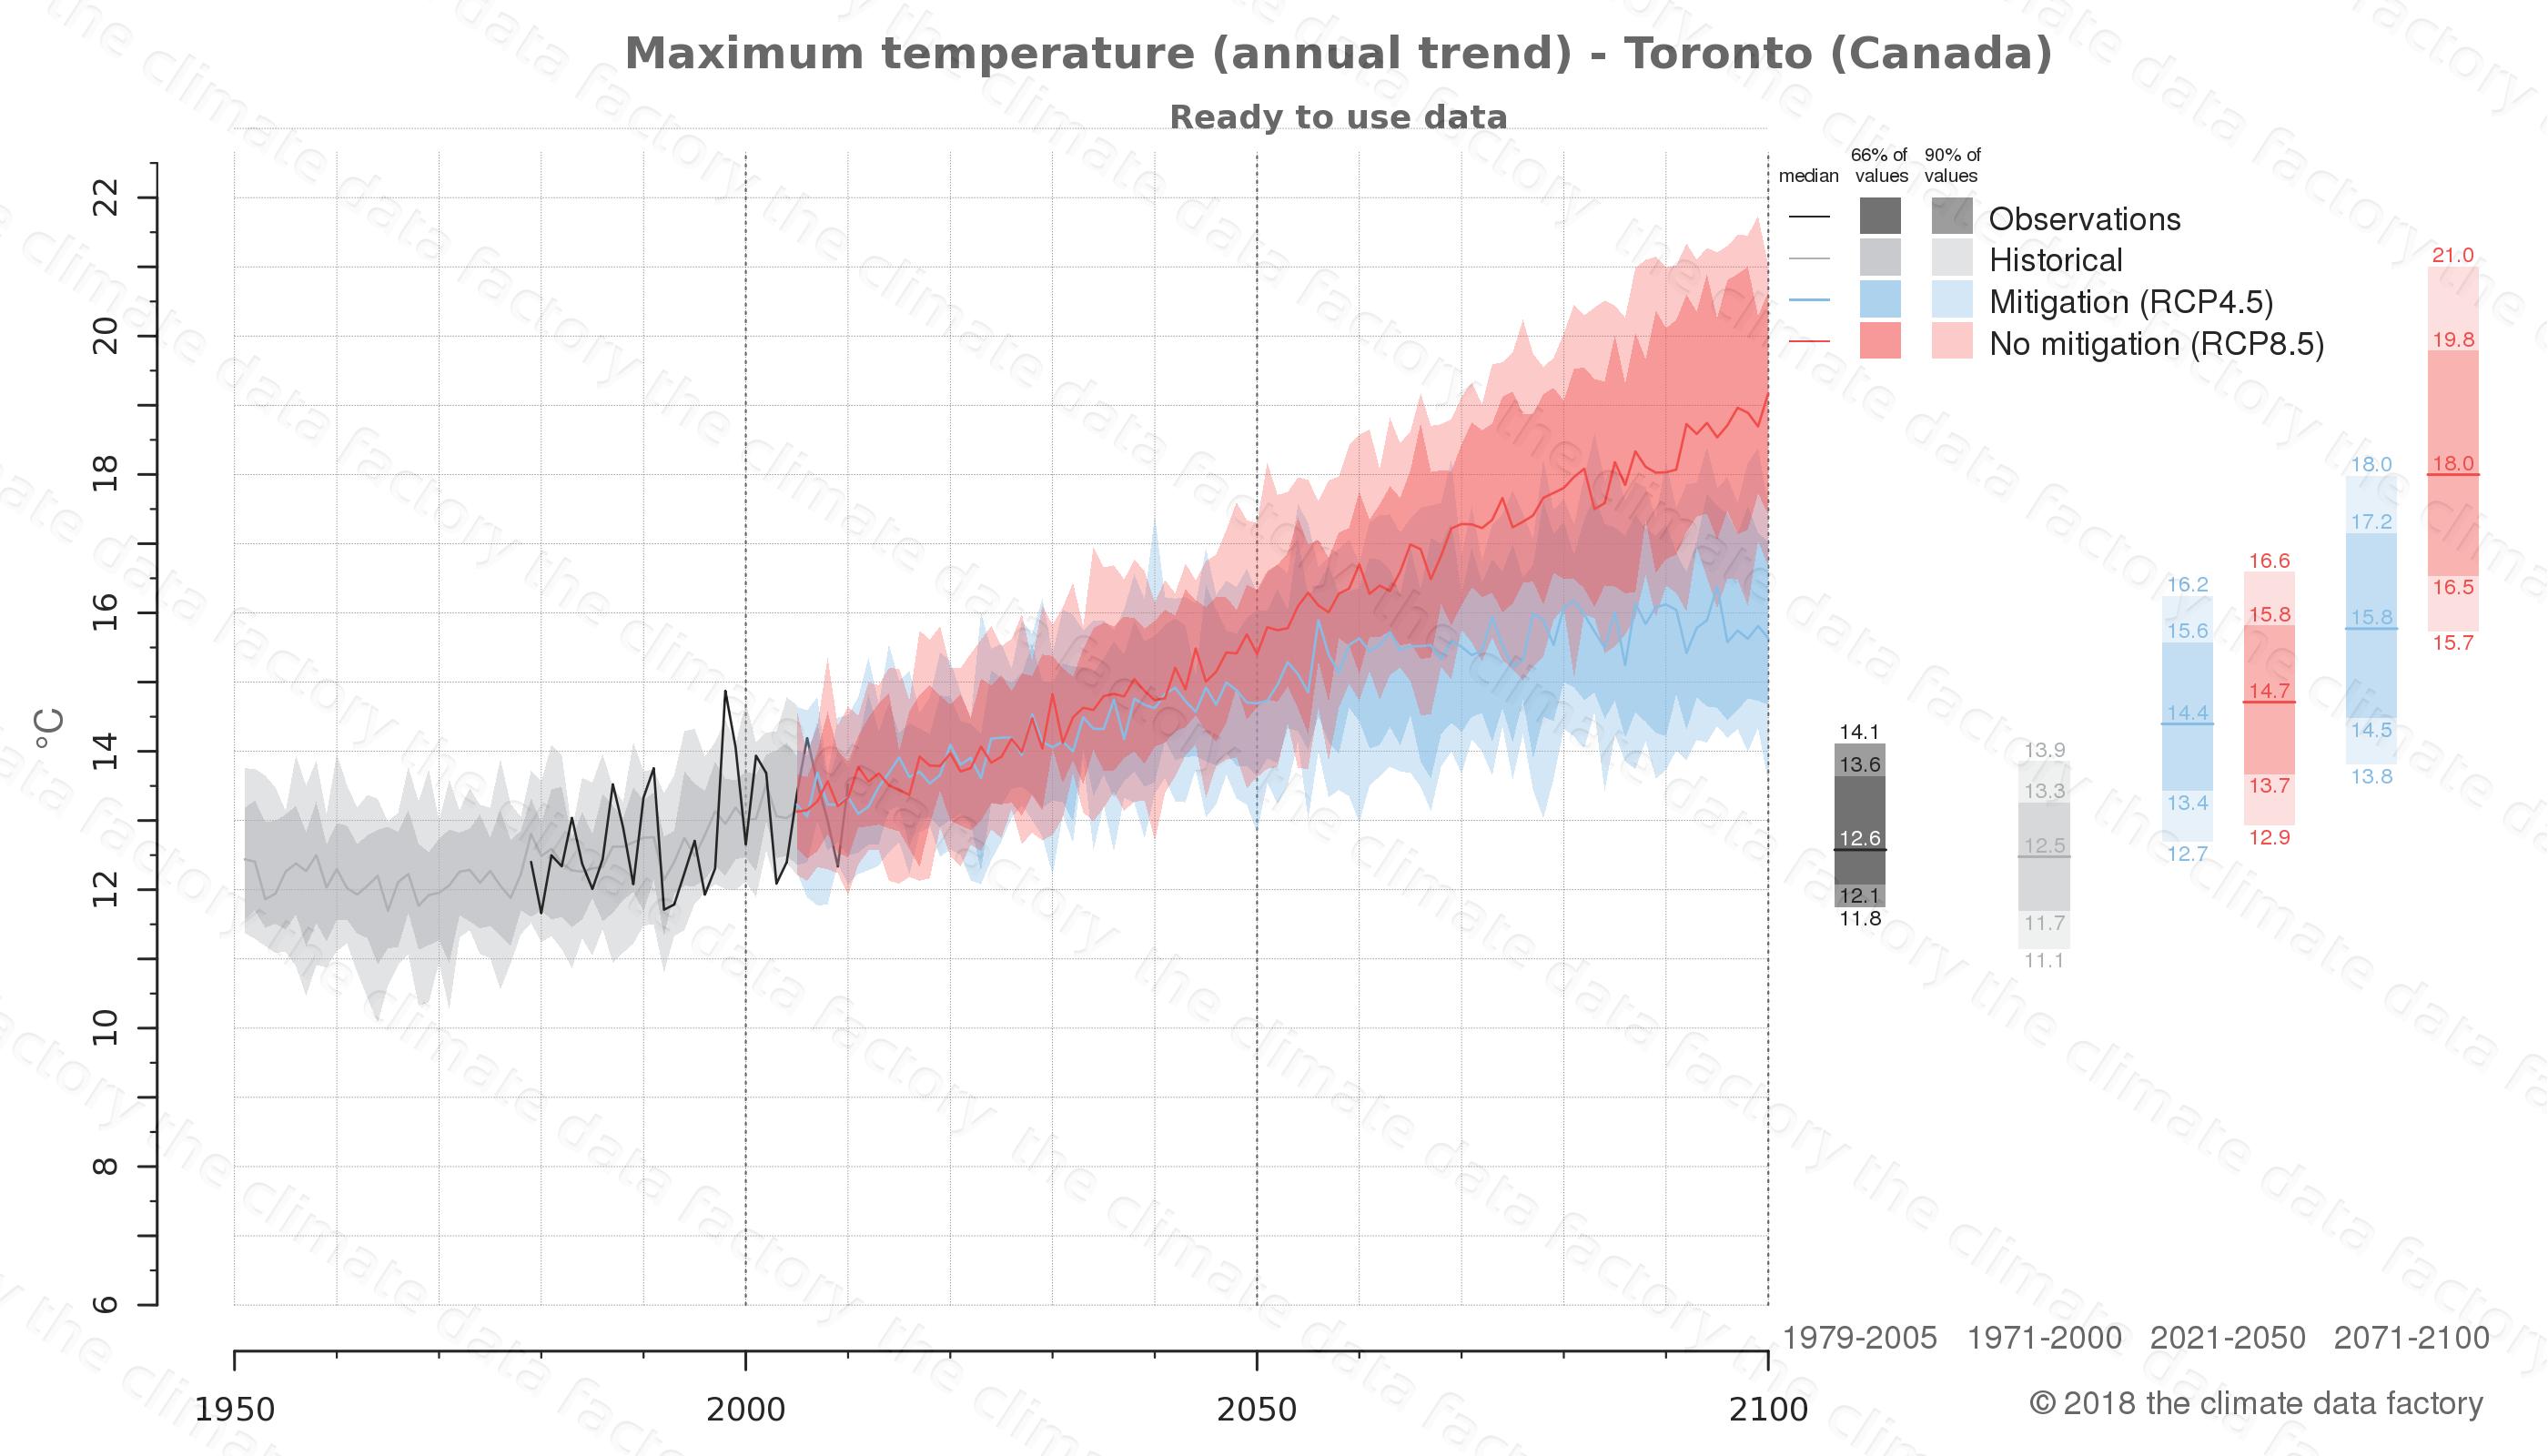 climate change data policy adaptation climate graph city data maximum-temperature toronto canada